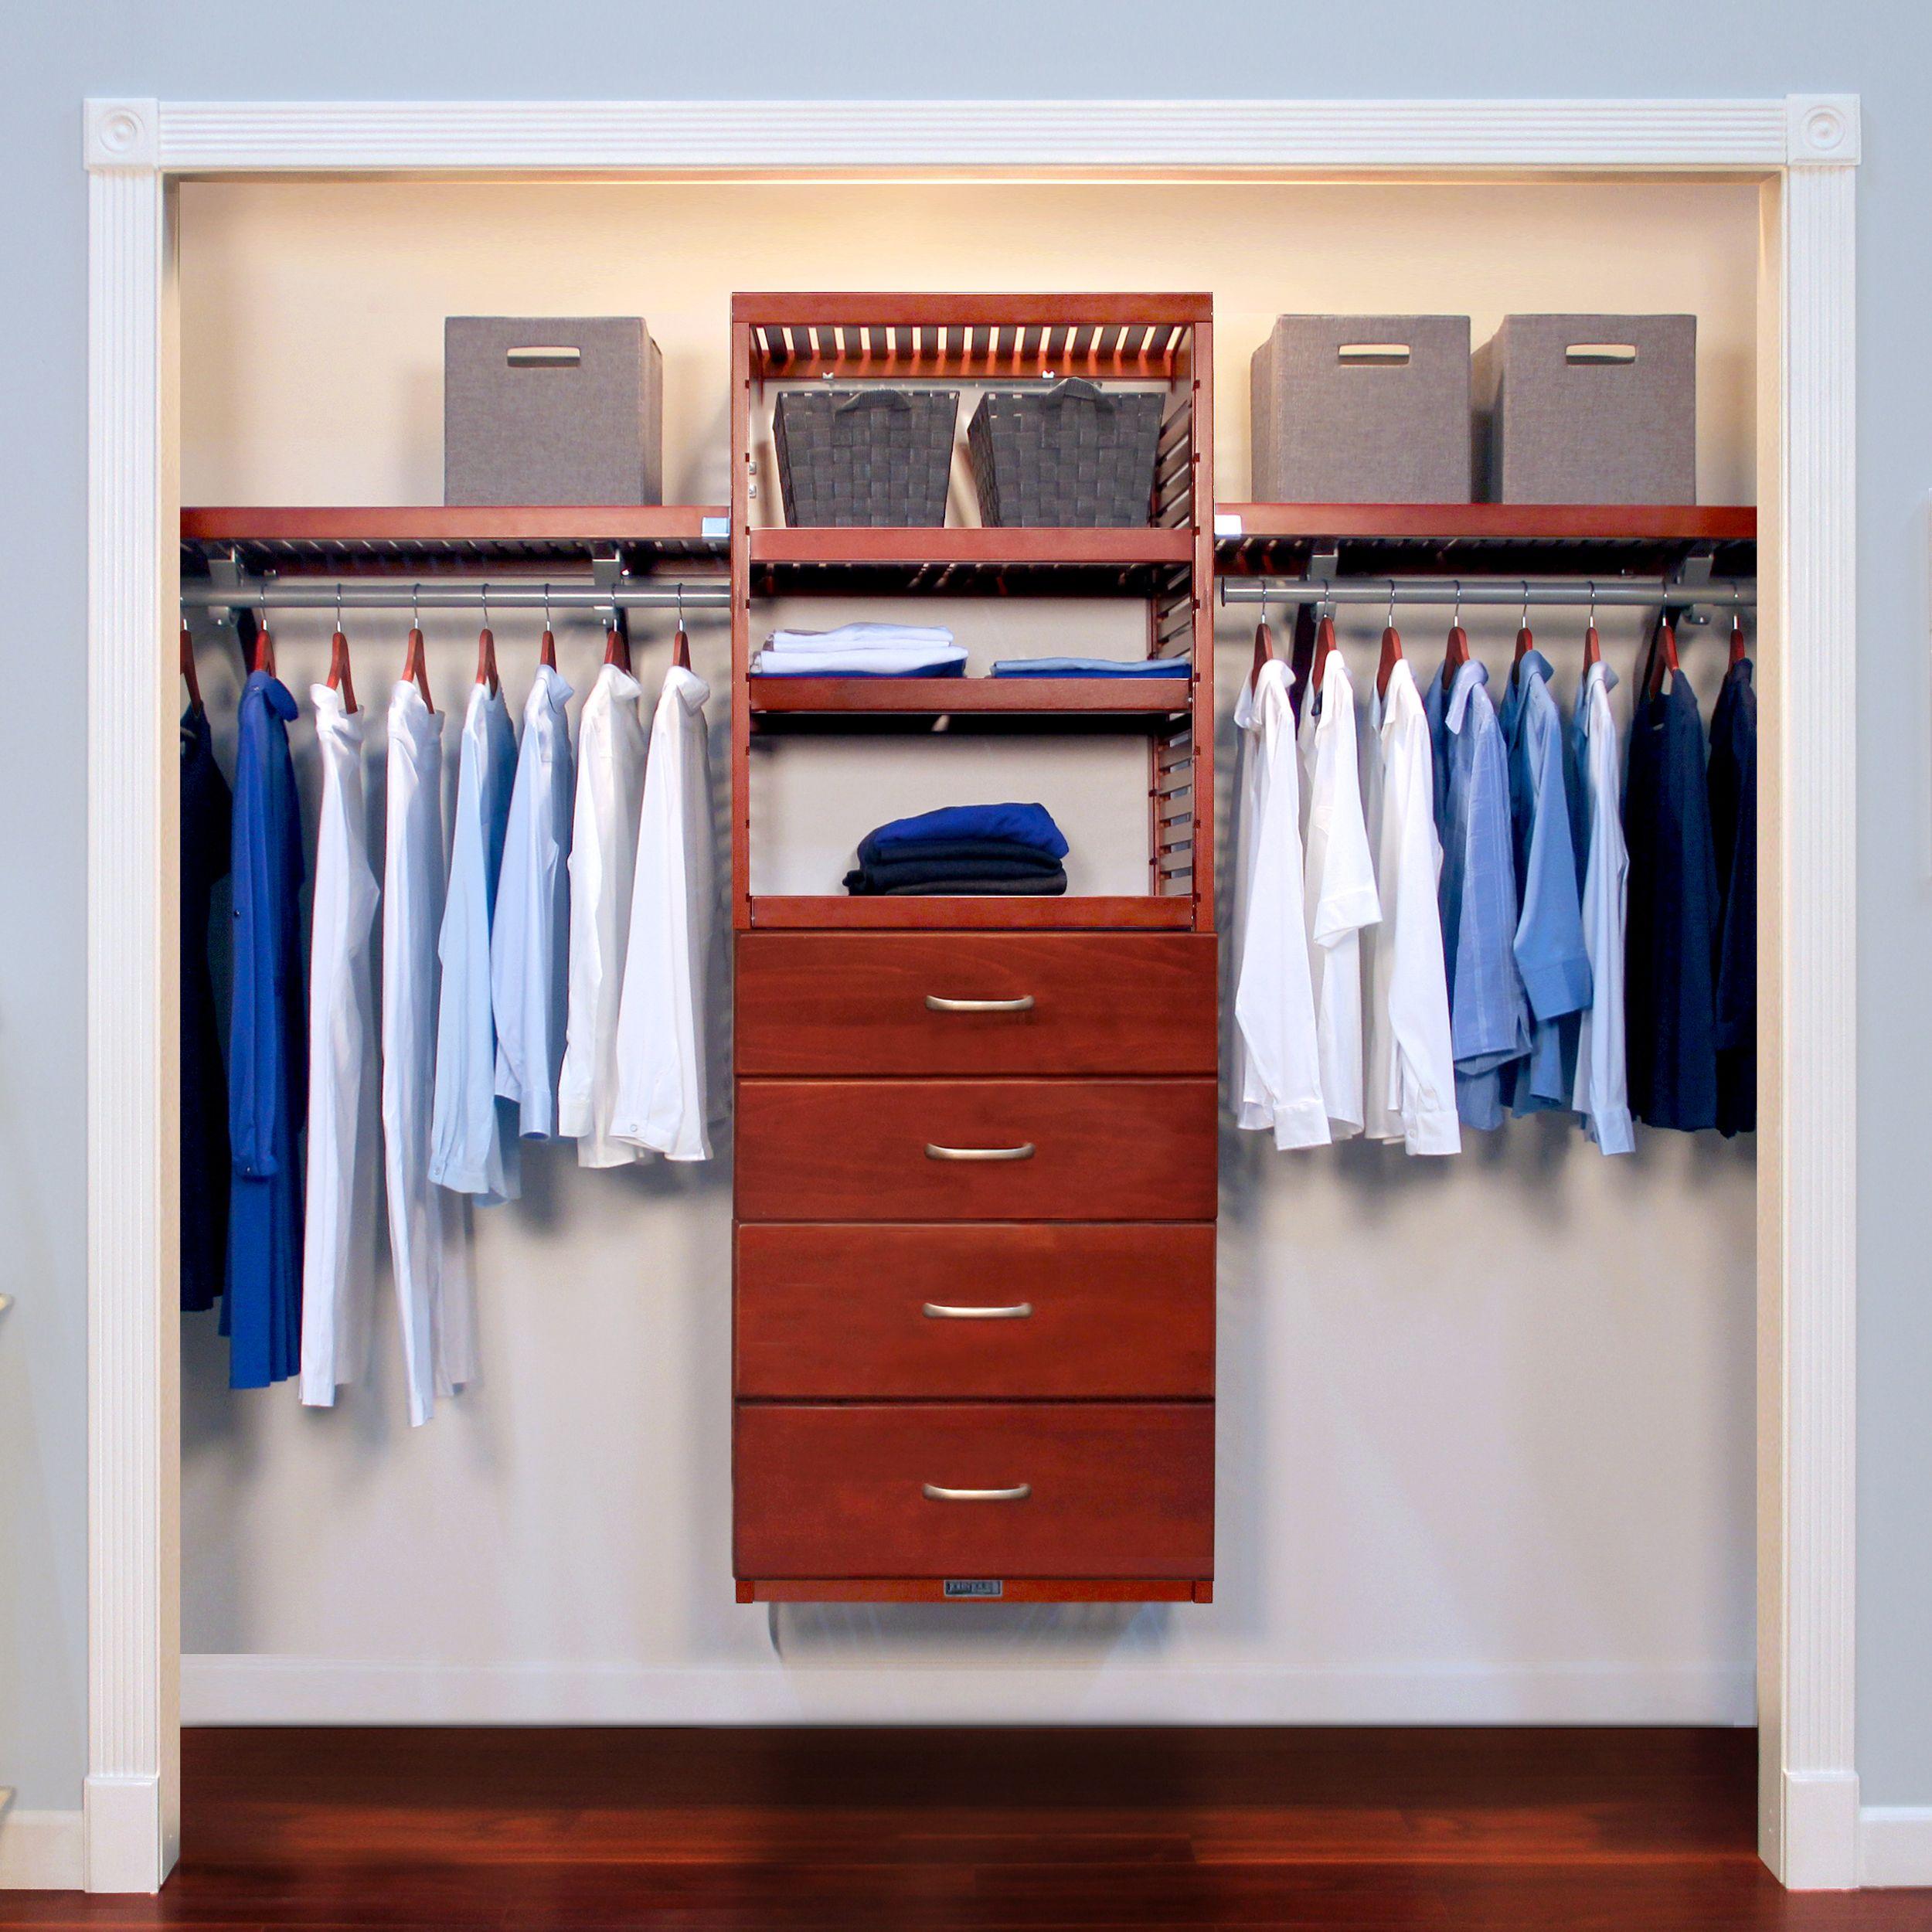 16in deep deluxe organizer 4 drawer 8 10in deep